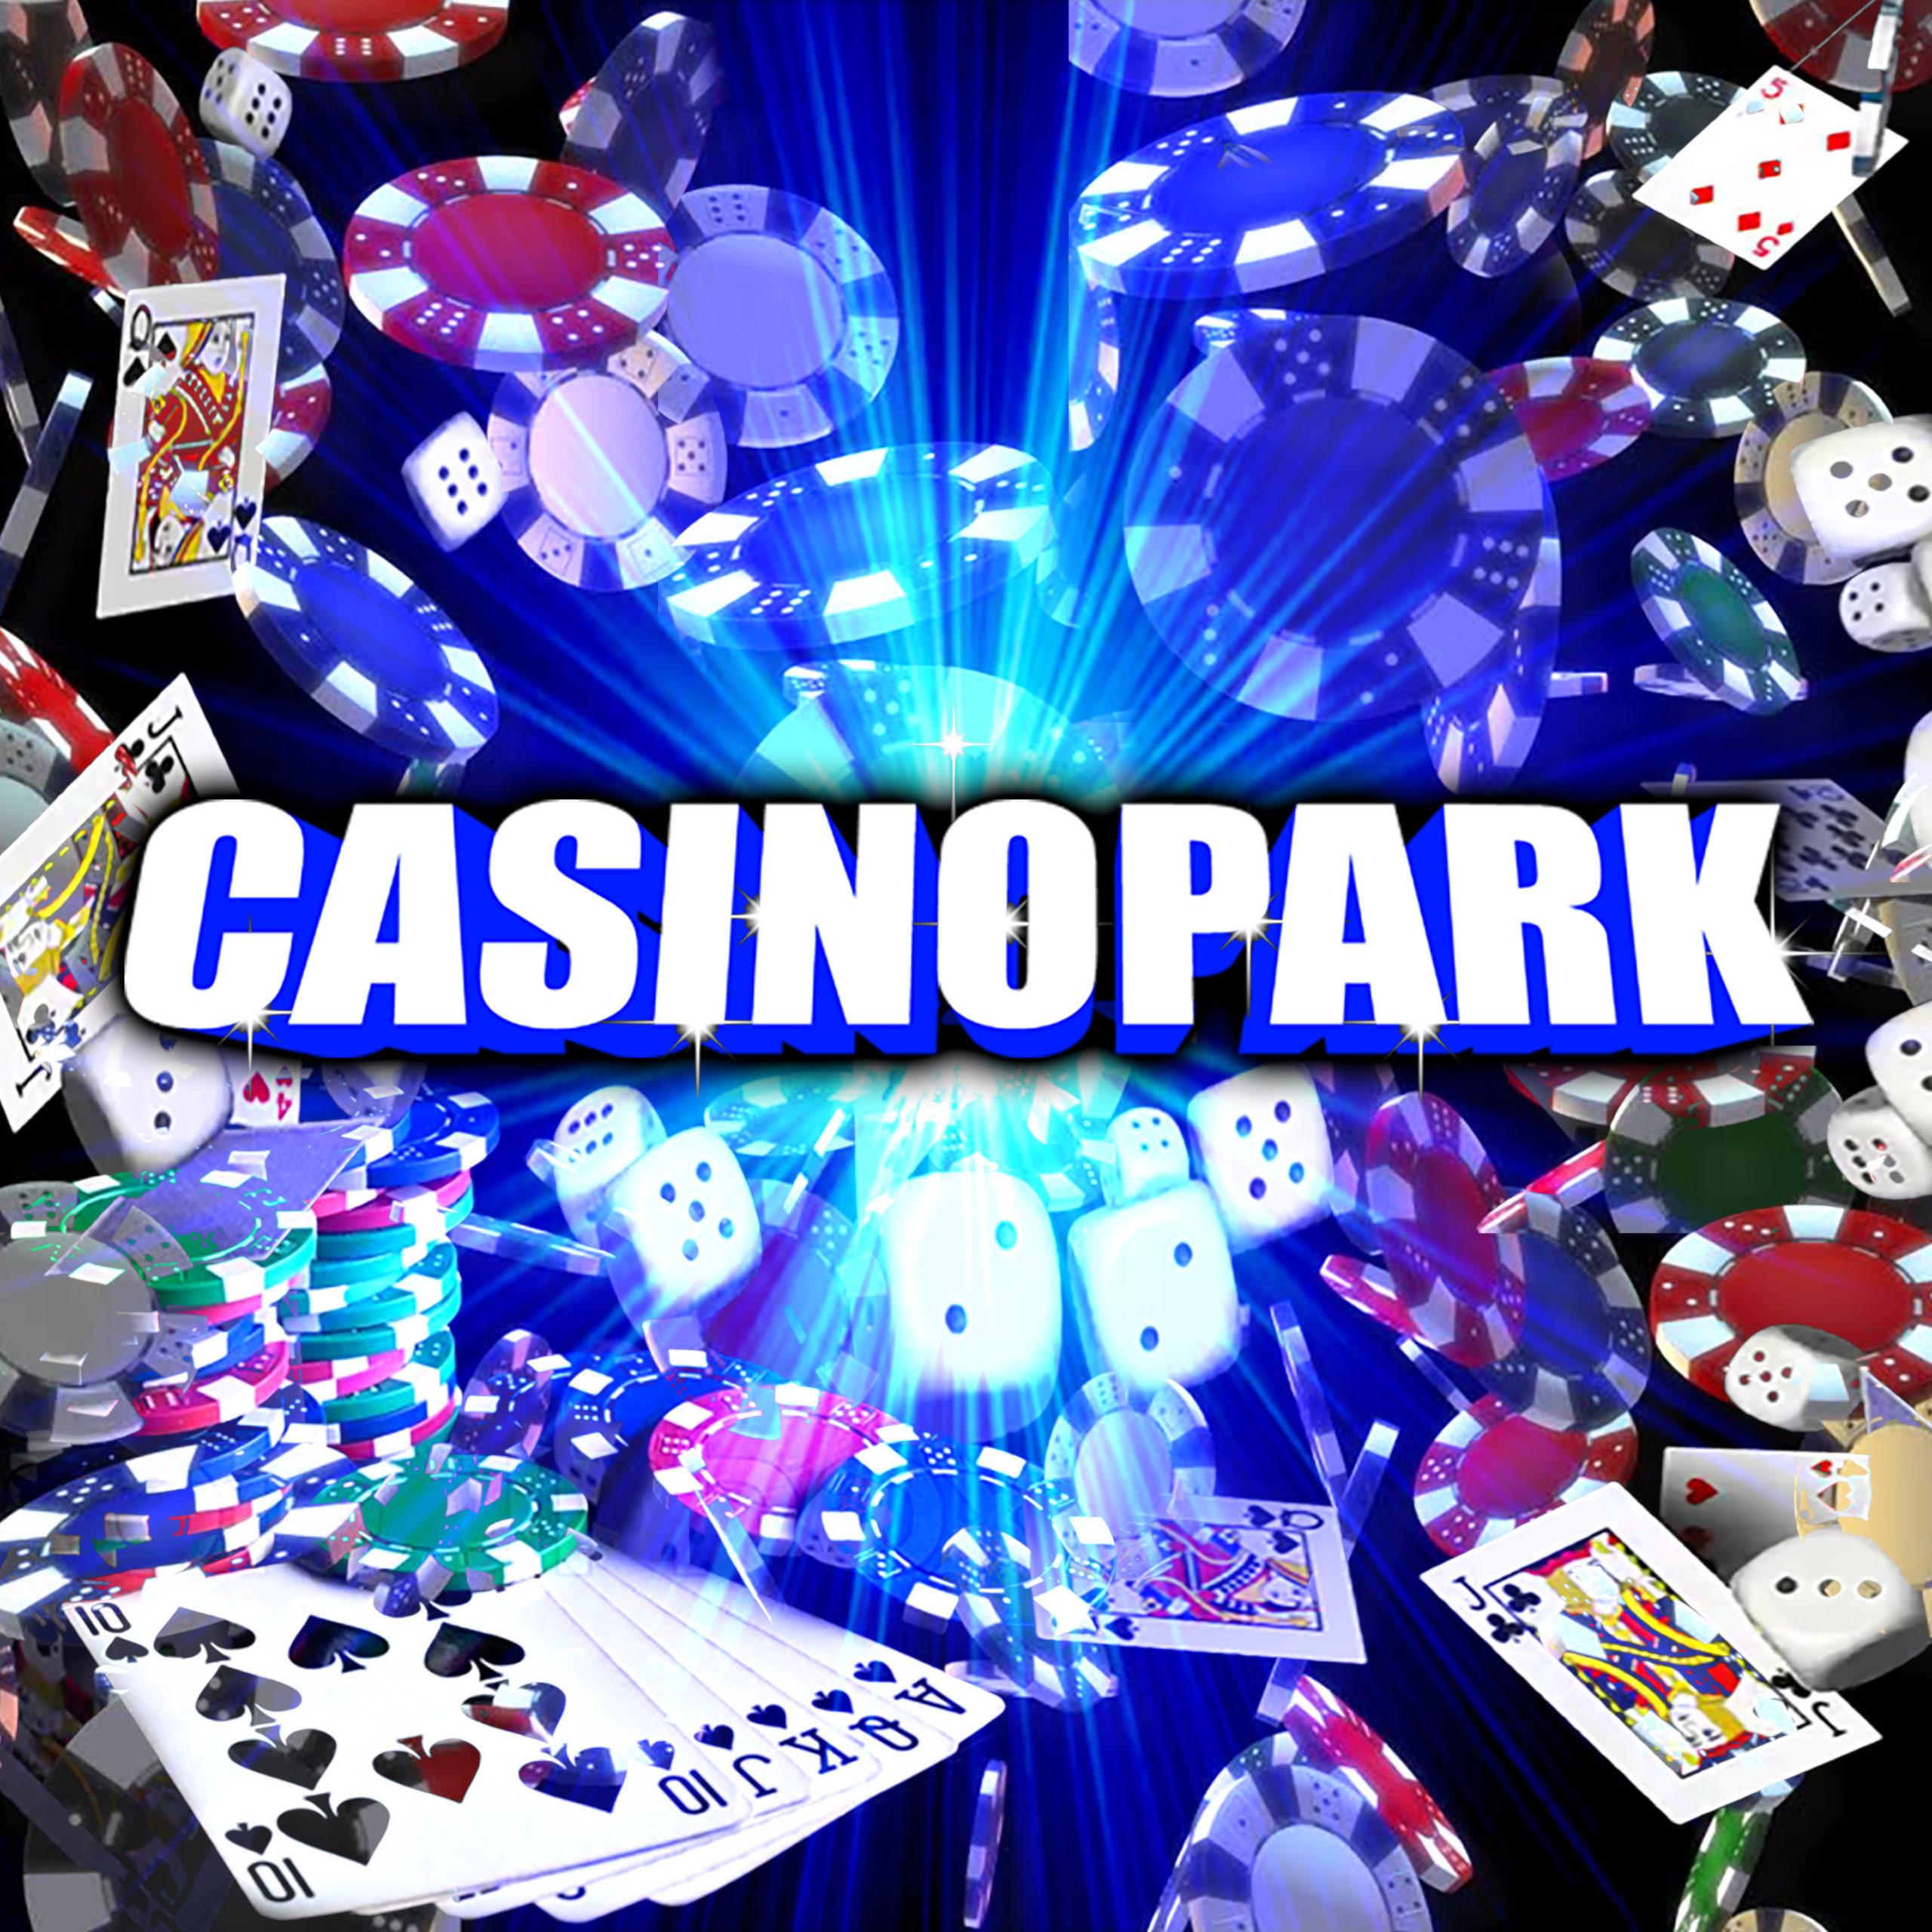 Casinopark